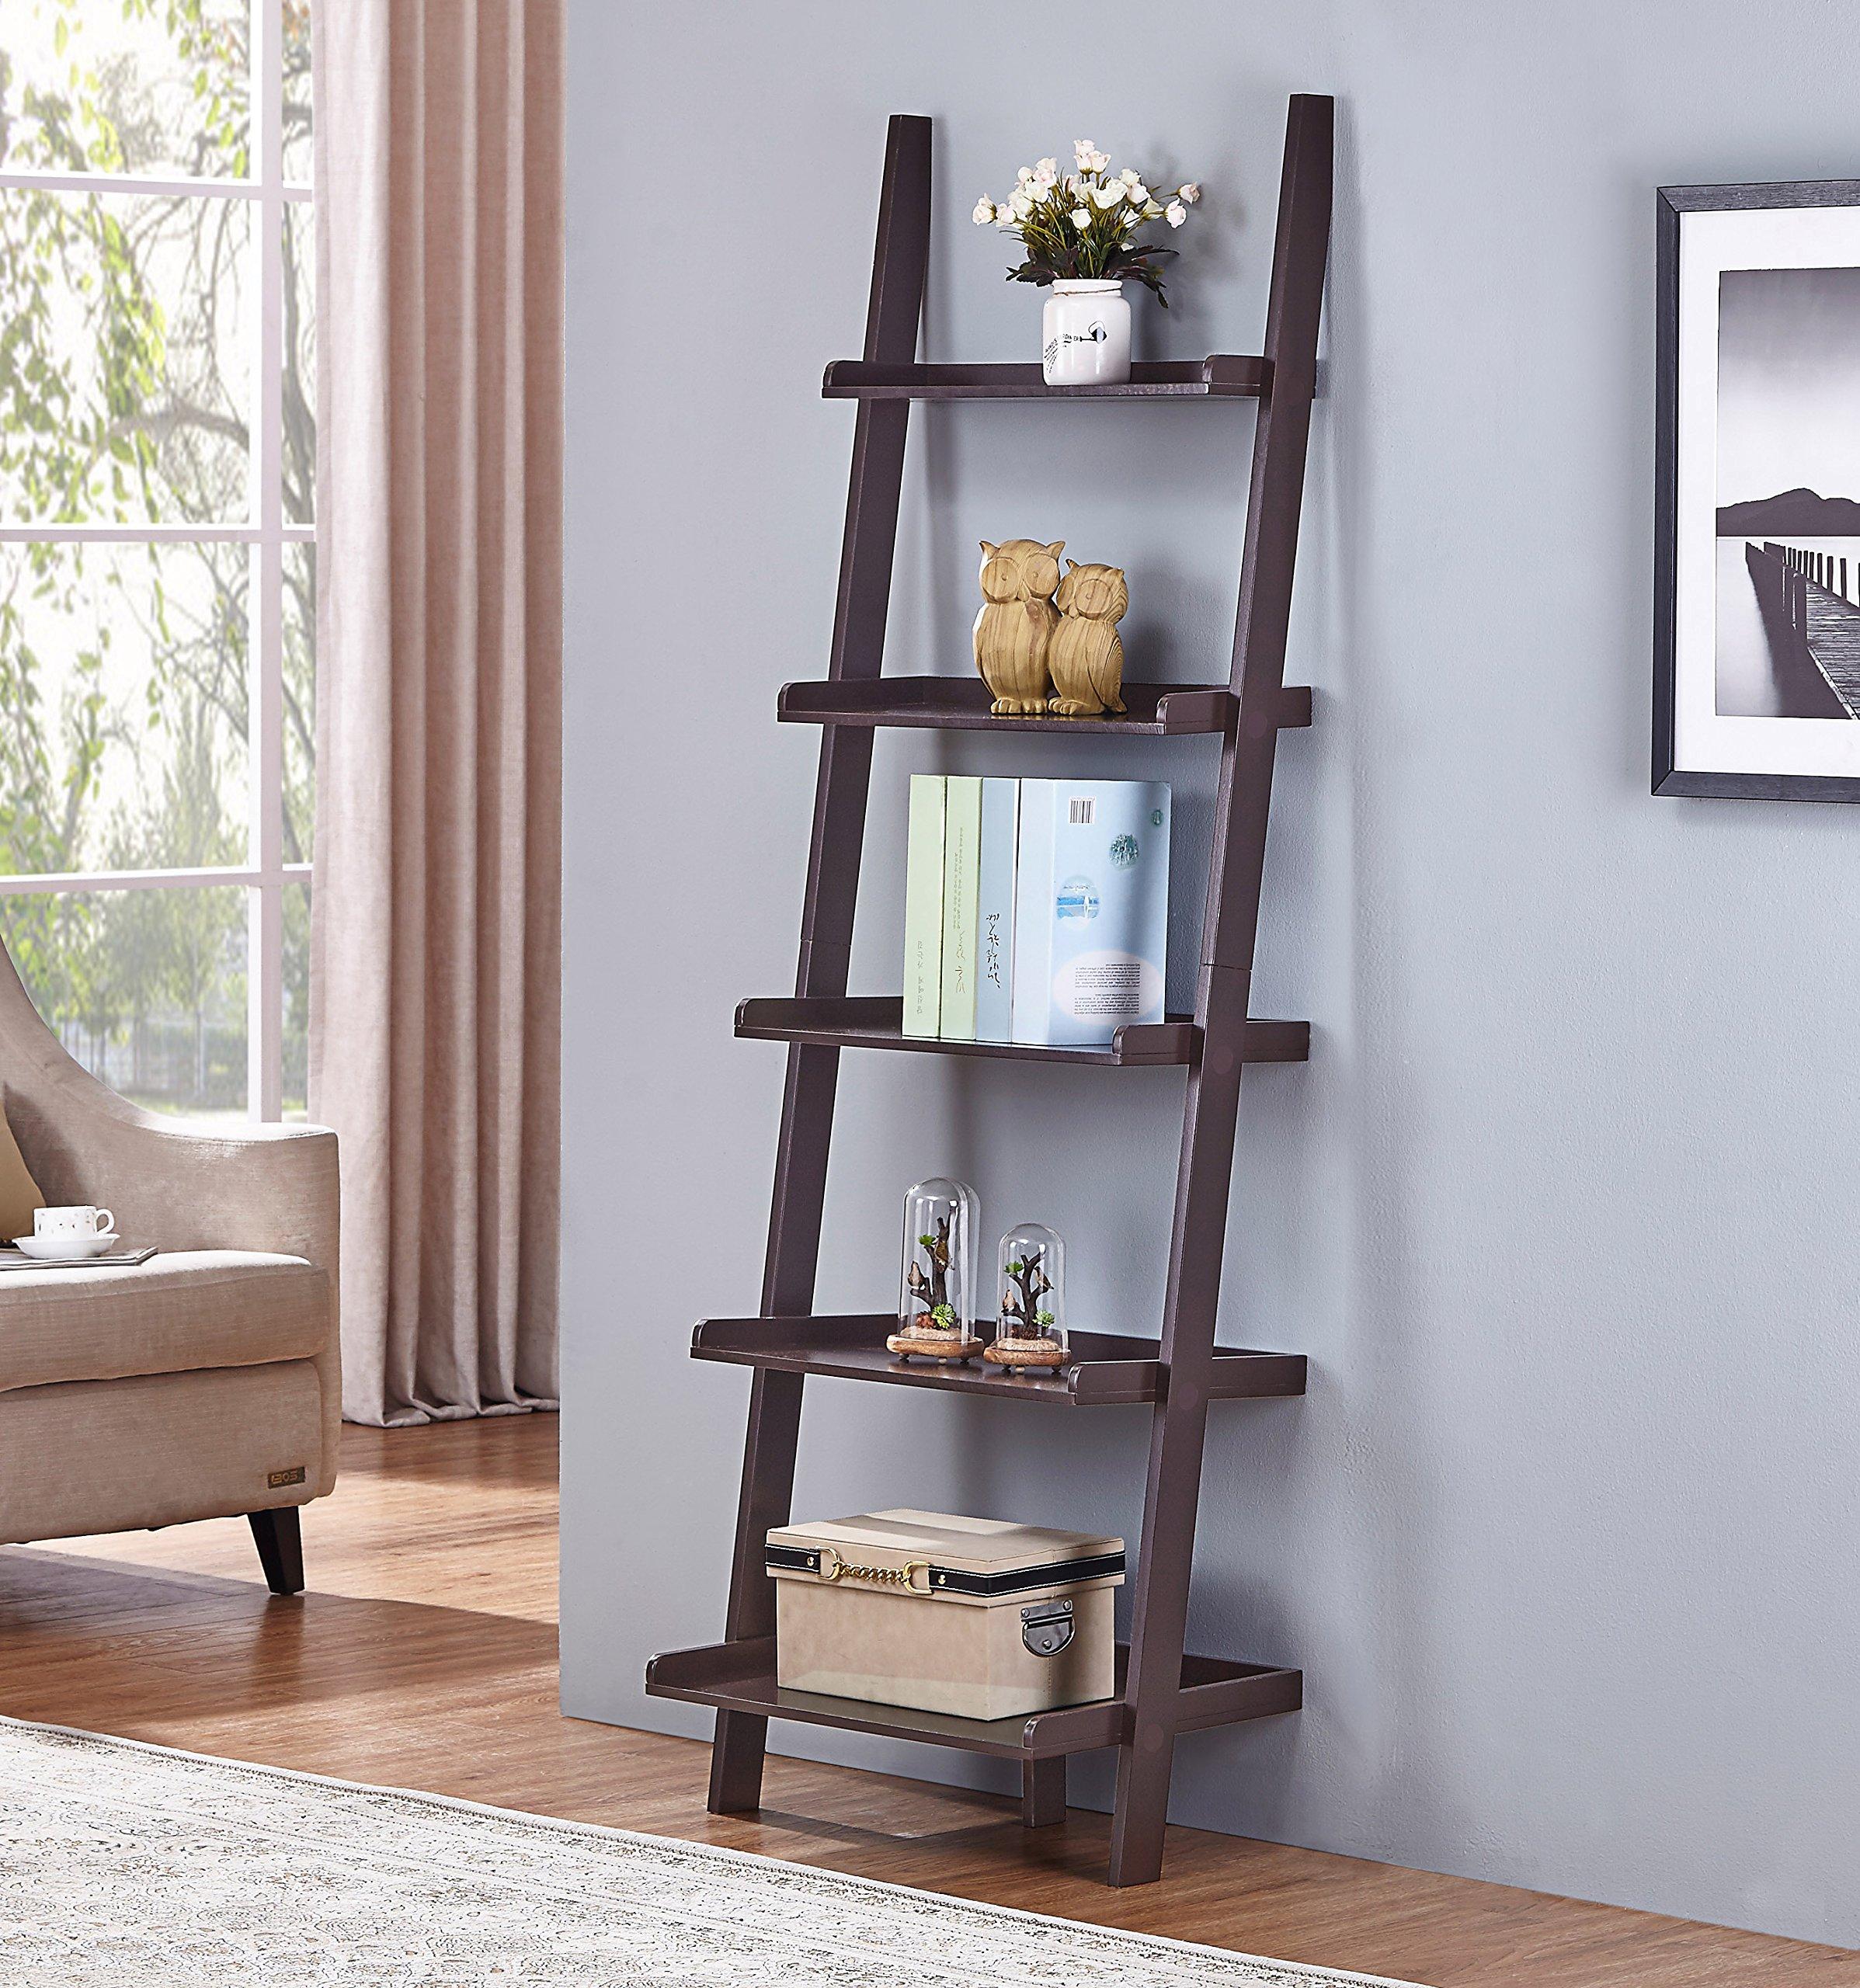 Espresso Finish 5 Tier Bookcase Shelf Ladder Leaning - 72'' Height